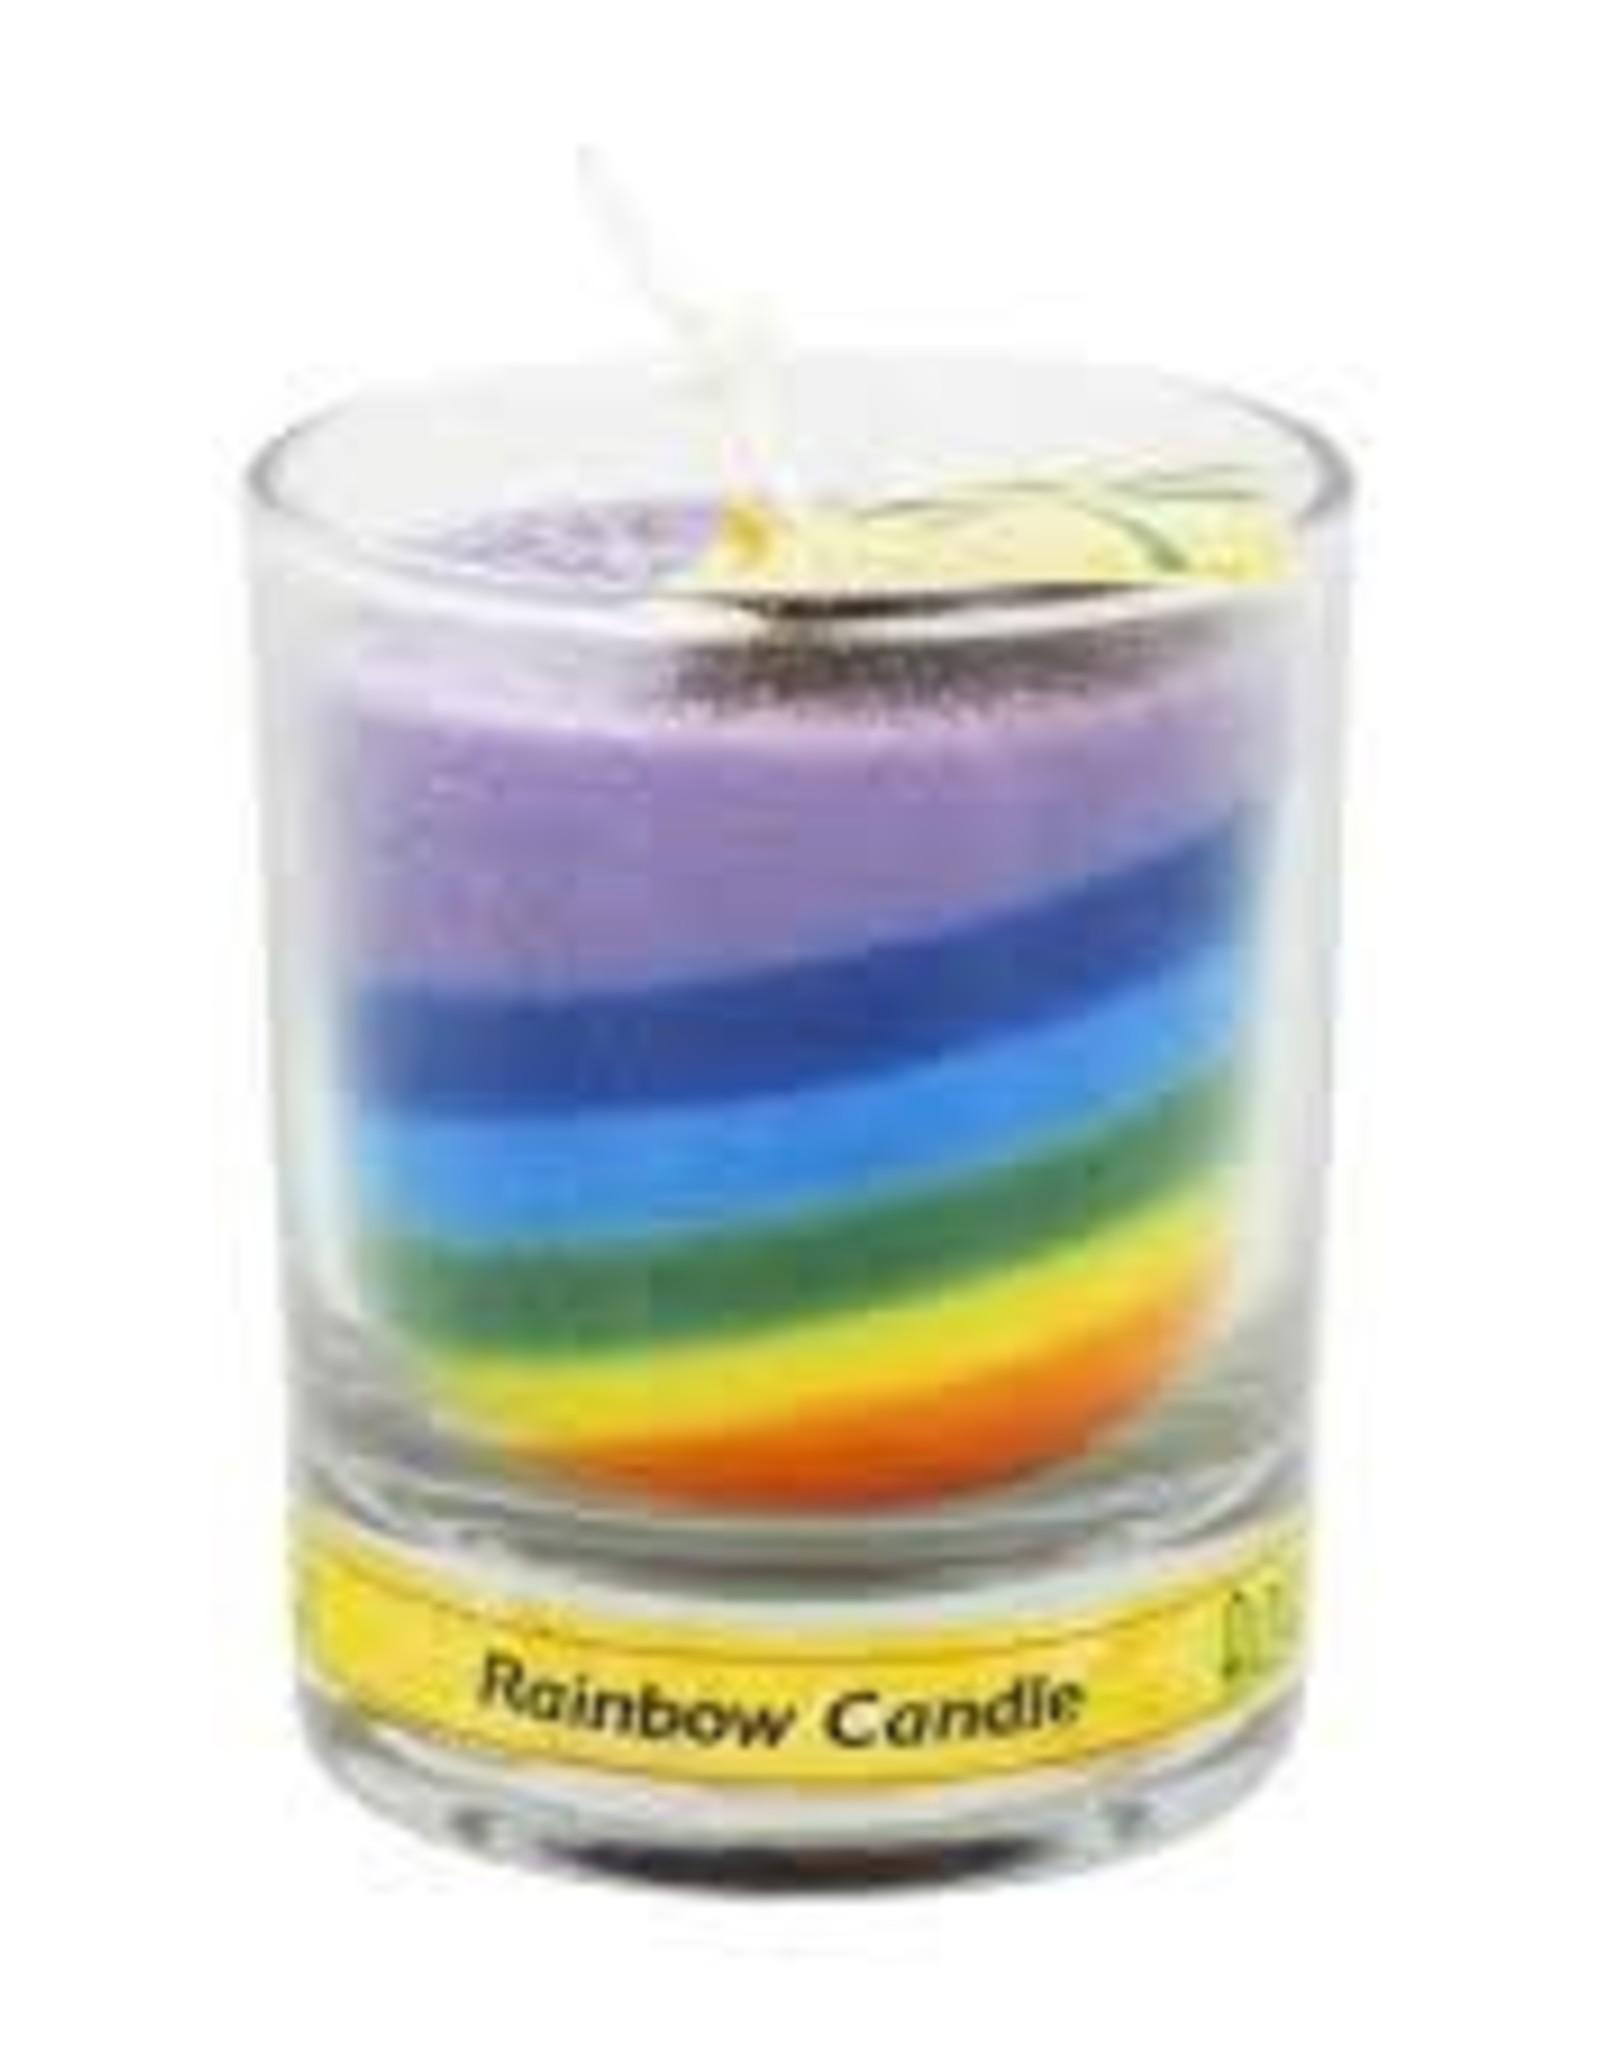 Aloha Bay Aloha Bay Rainbow Candle